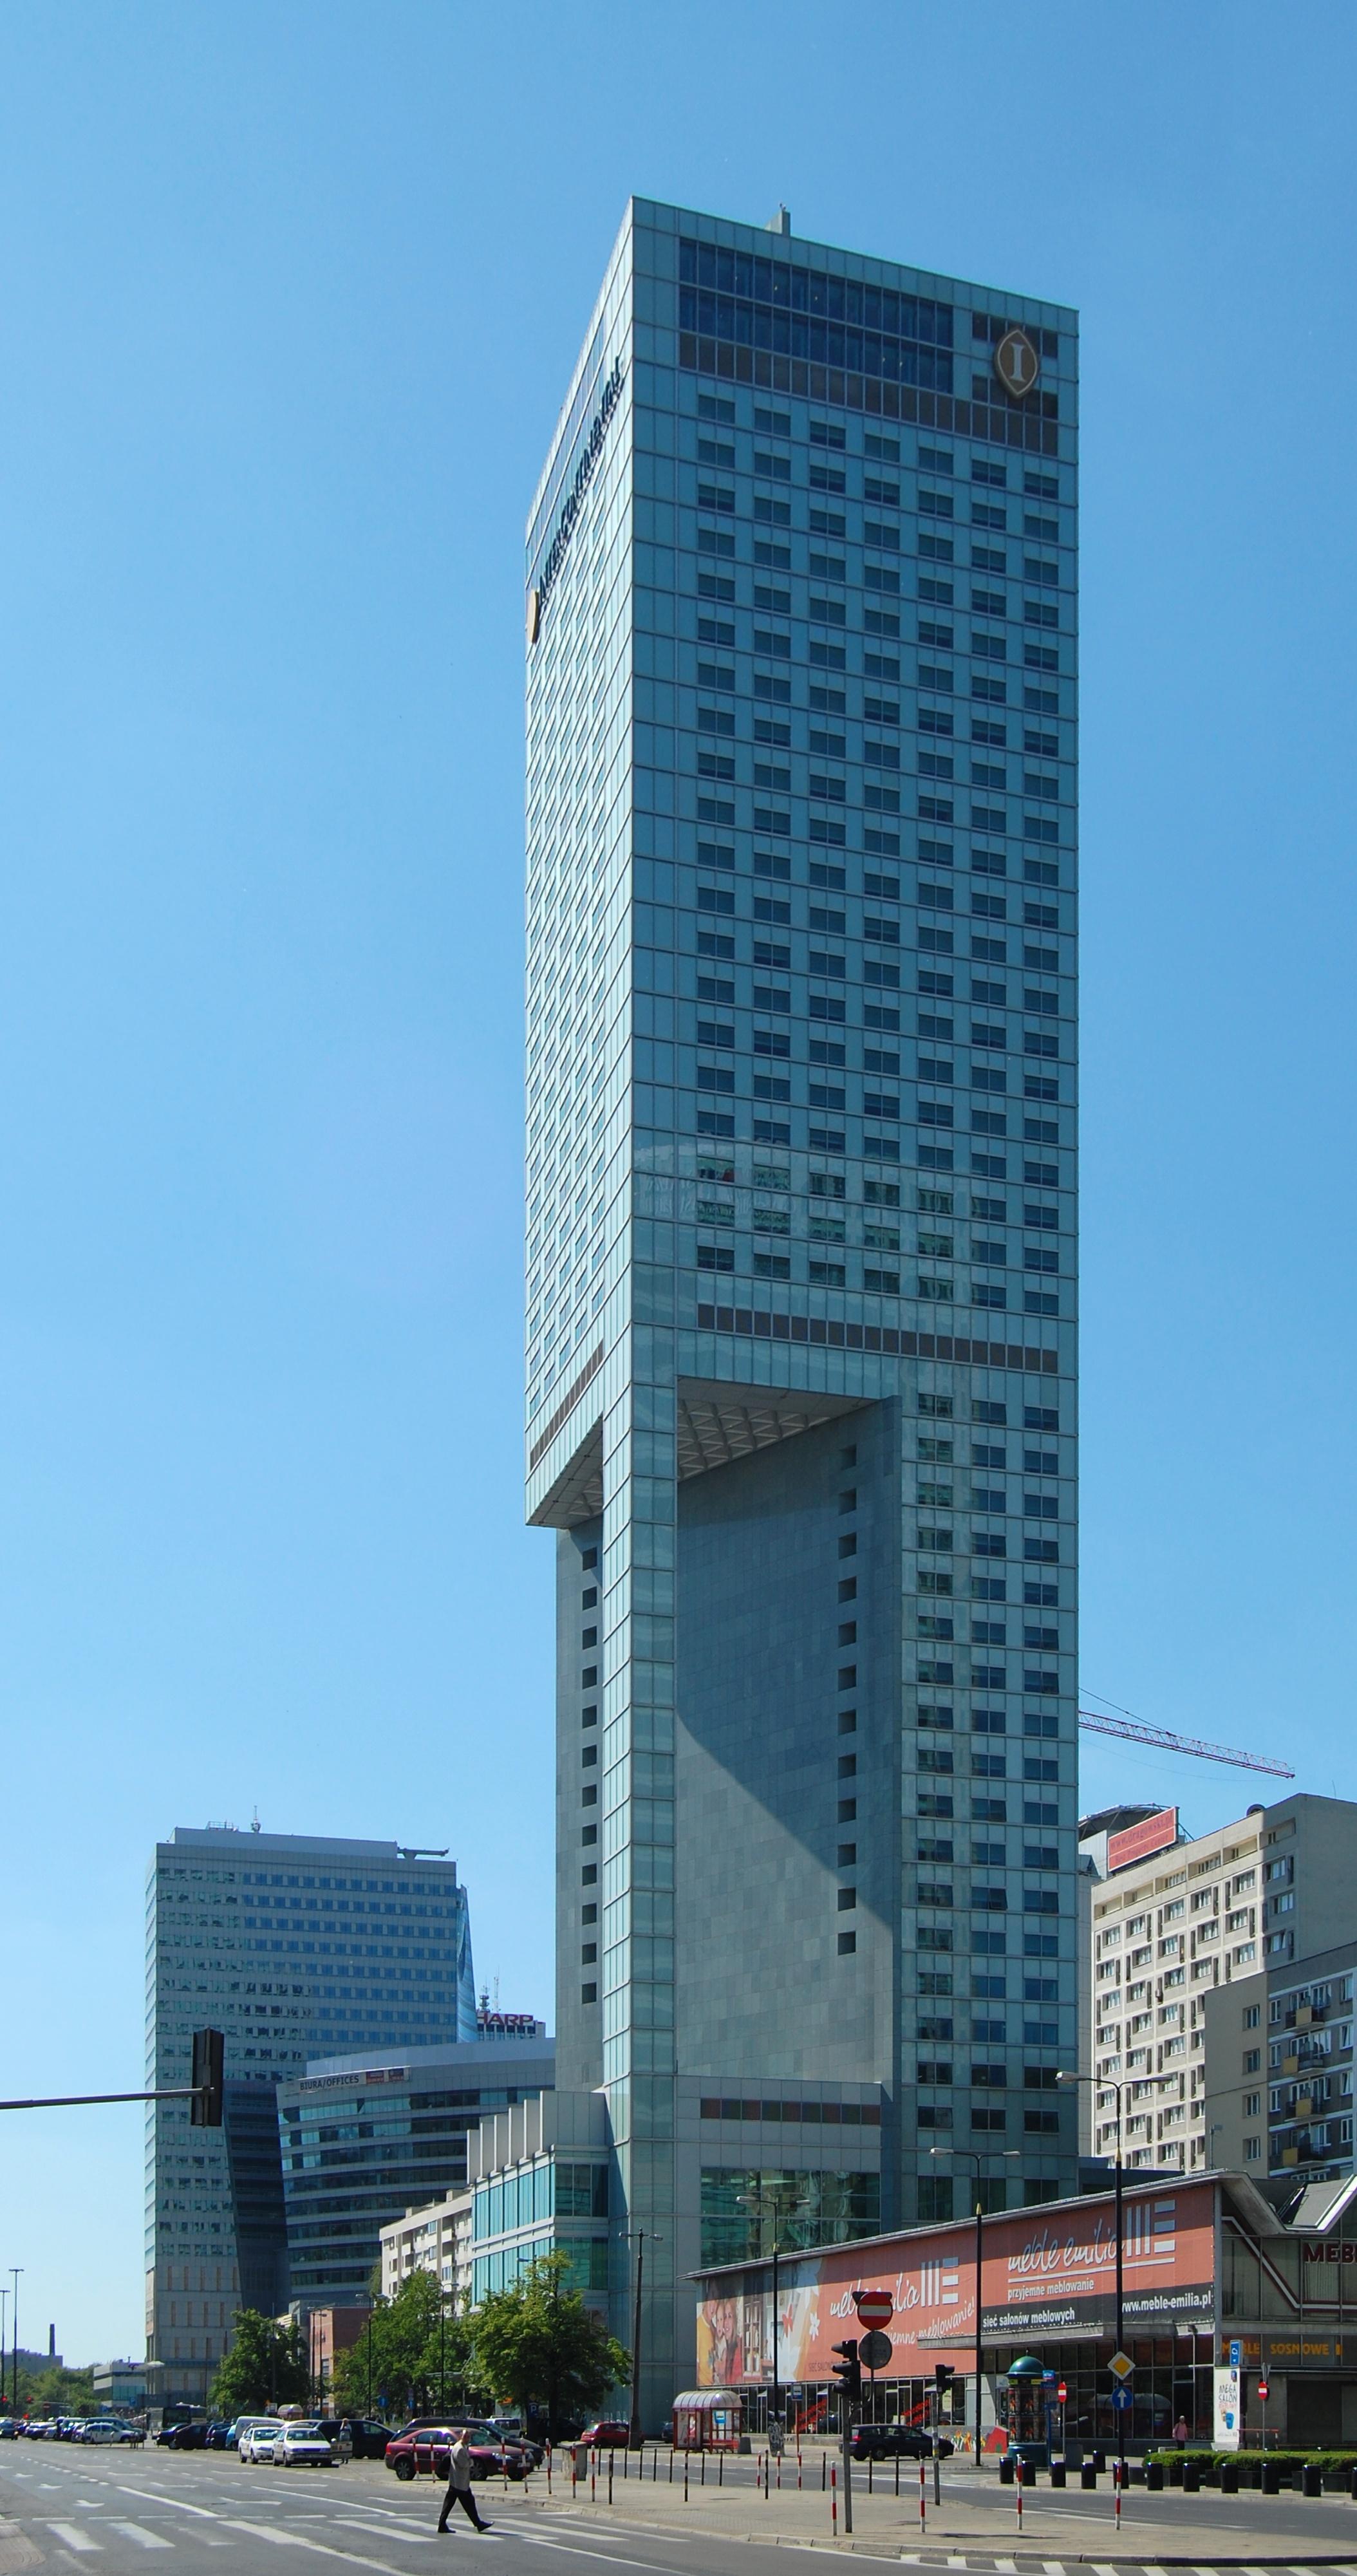 Marriott Hotel Den Haag Parken